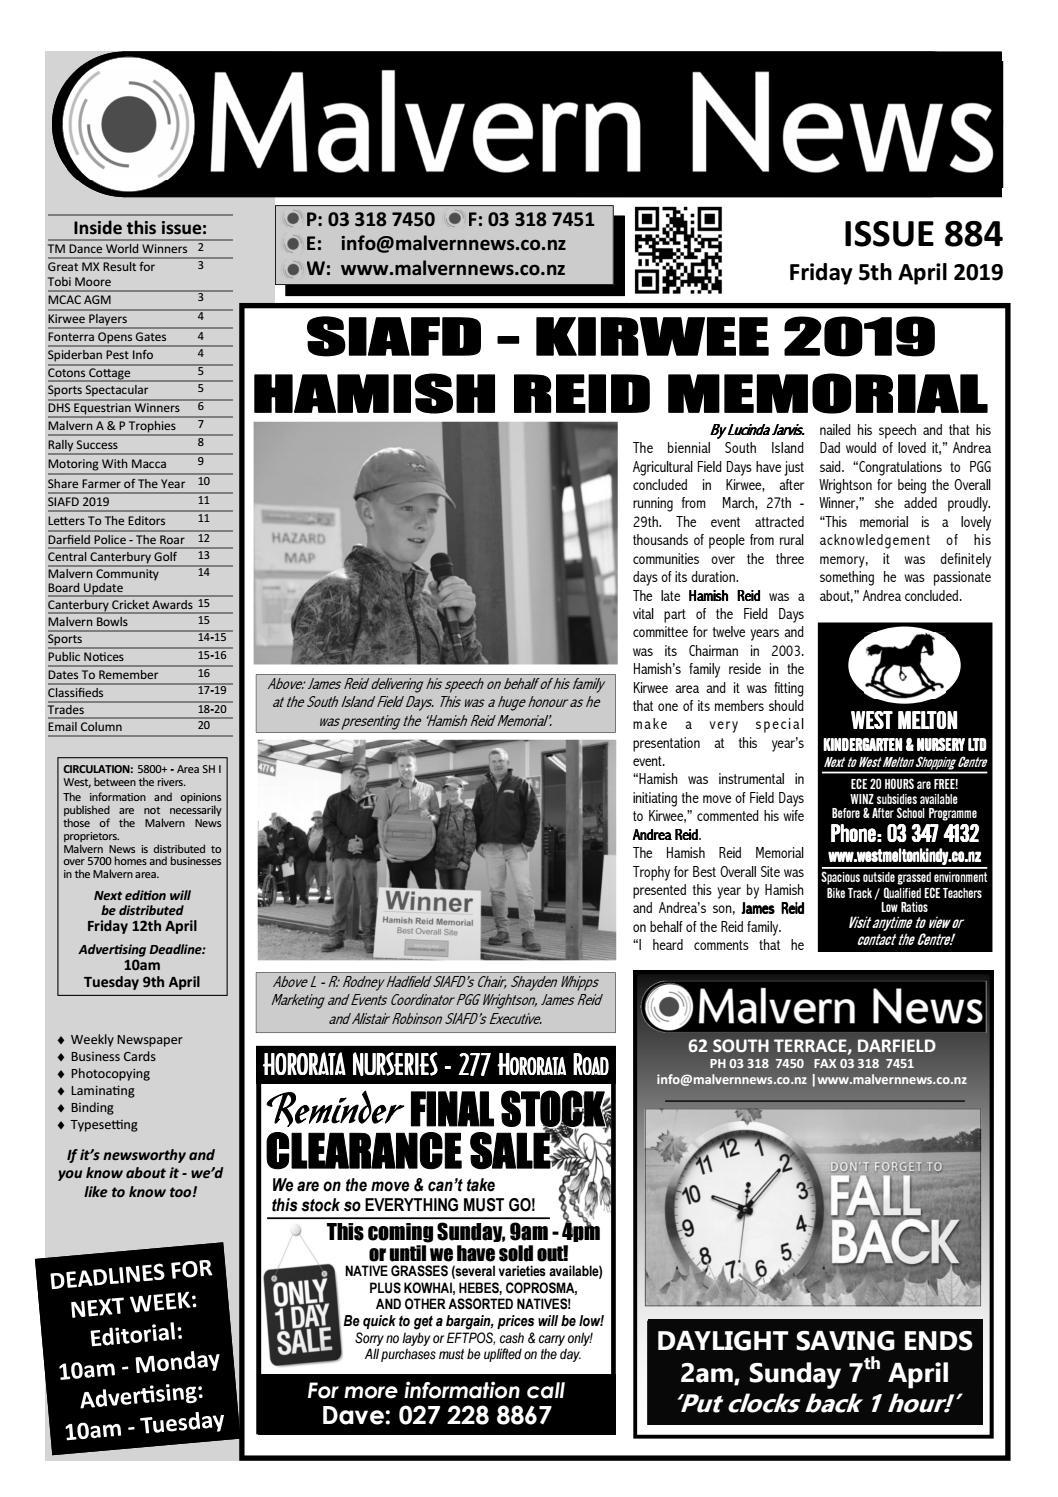 Issue 884 - Friday 5th April 2019 by Malvern News - issuu